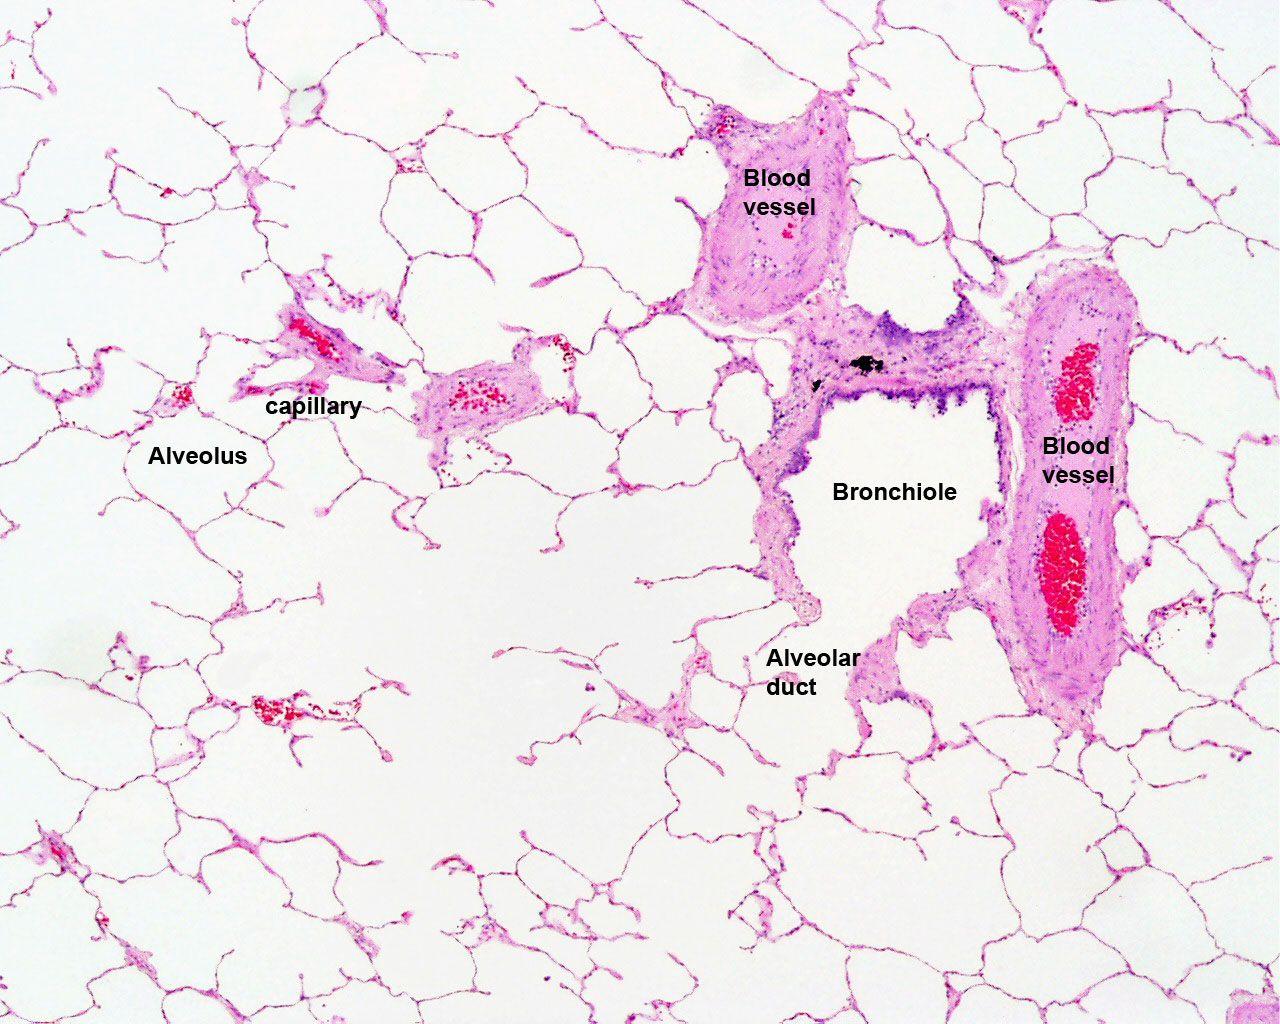 lung histology labeled - bronchiole, alveolar duct, alveoli | lab practical pics | Pinterest ...